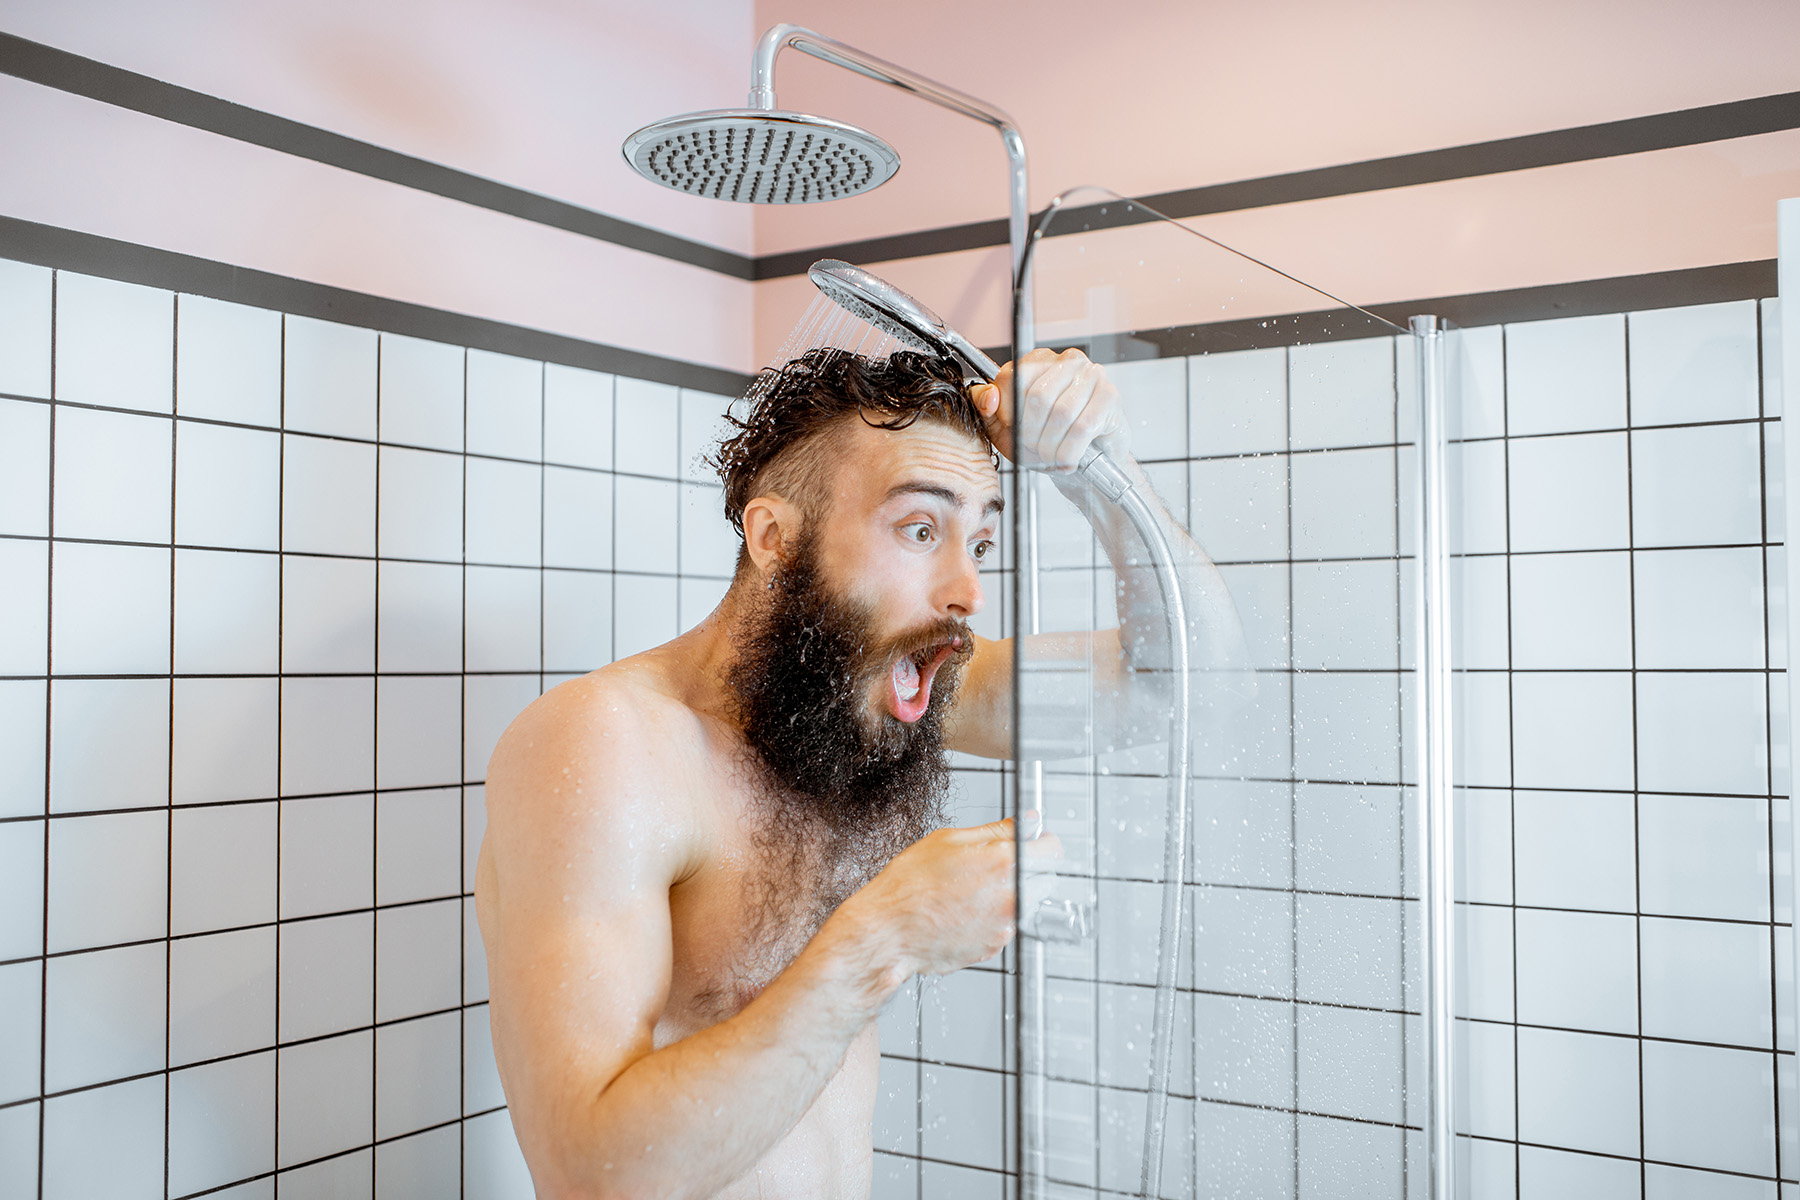 Surprised man in shower